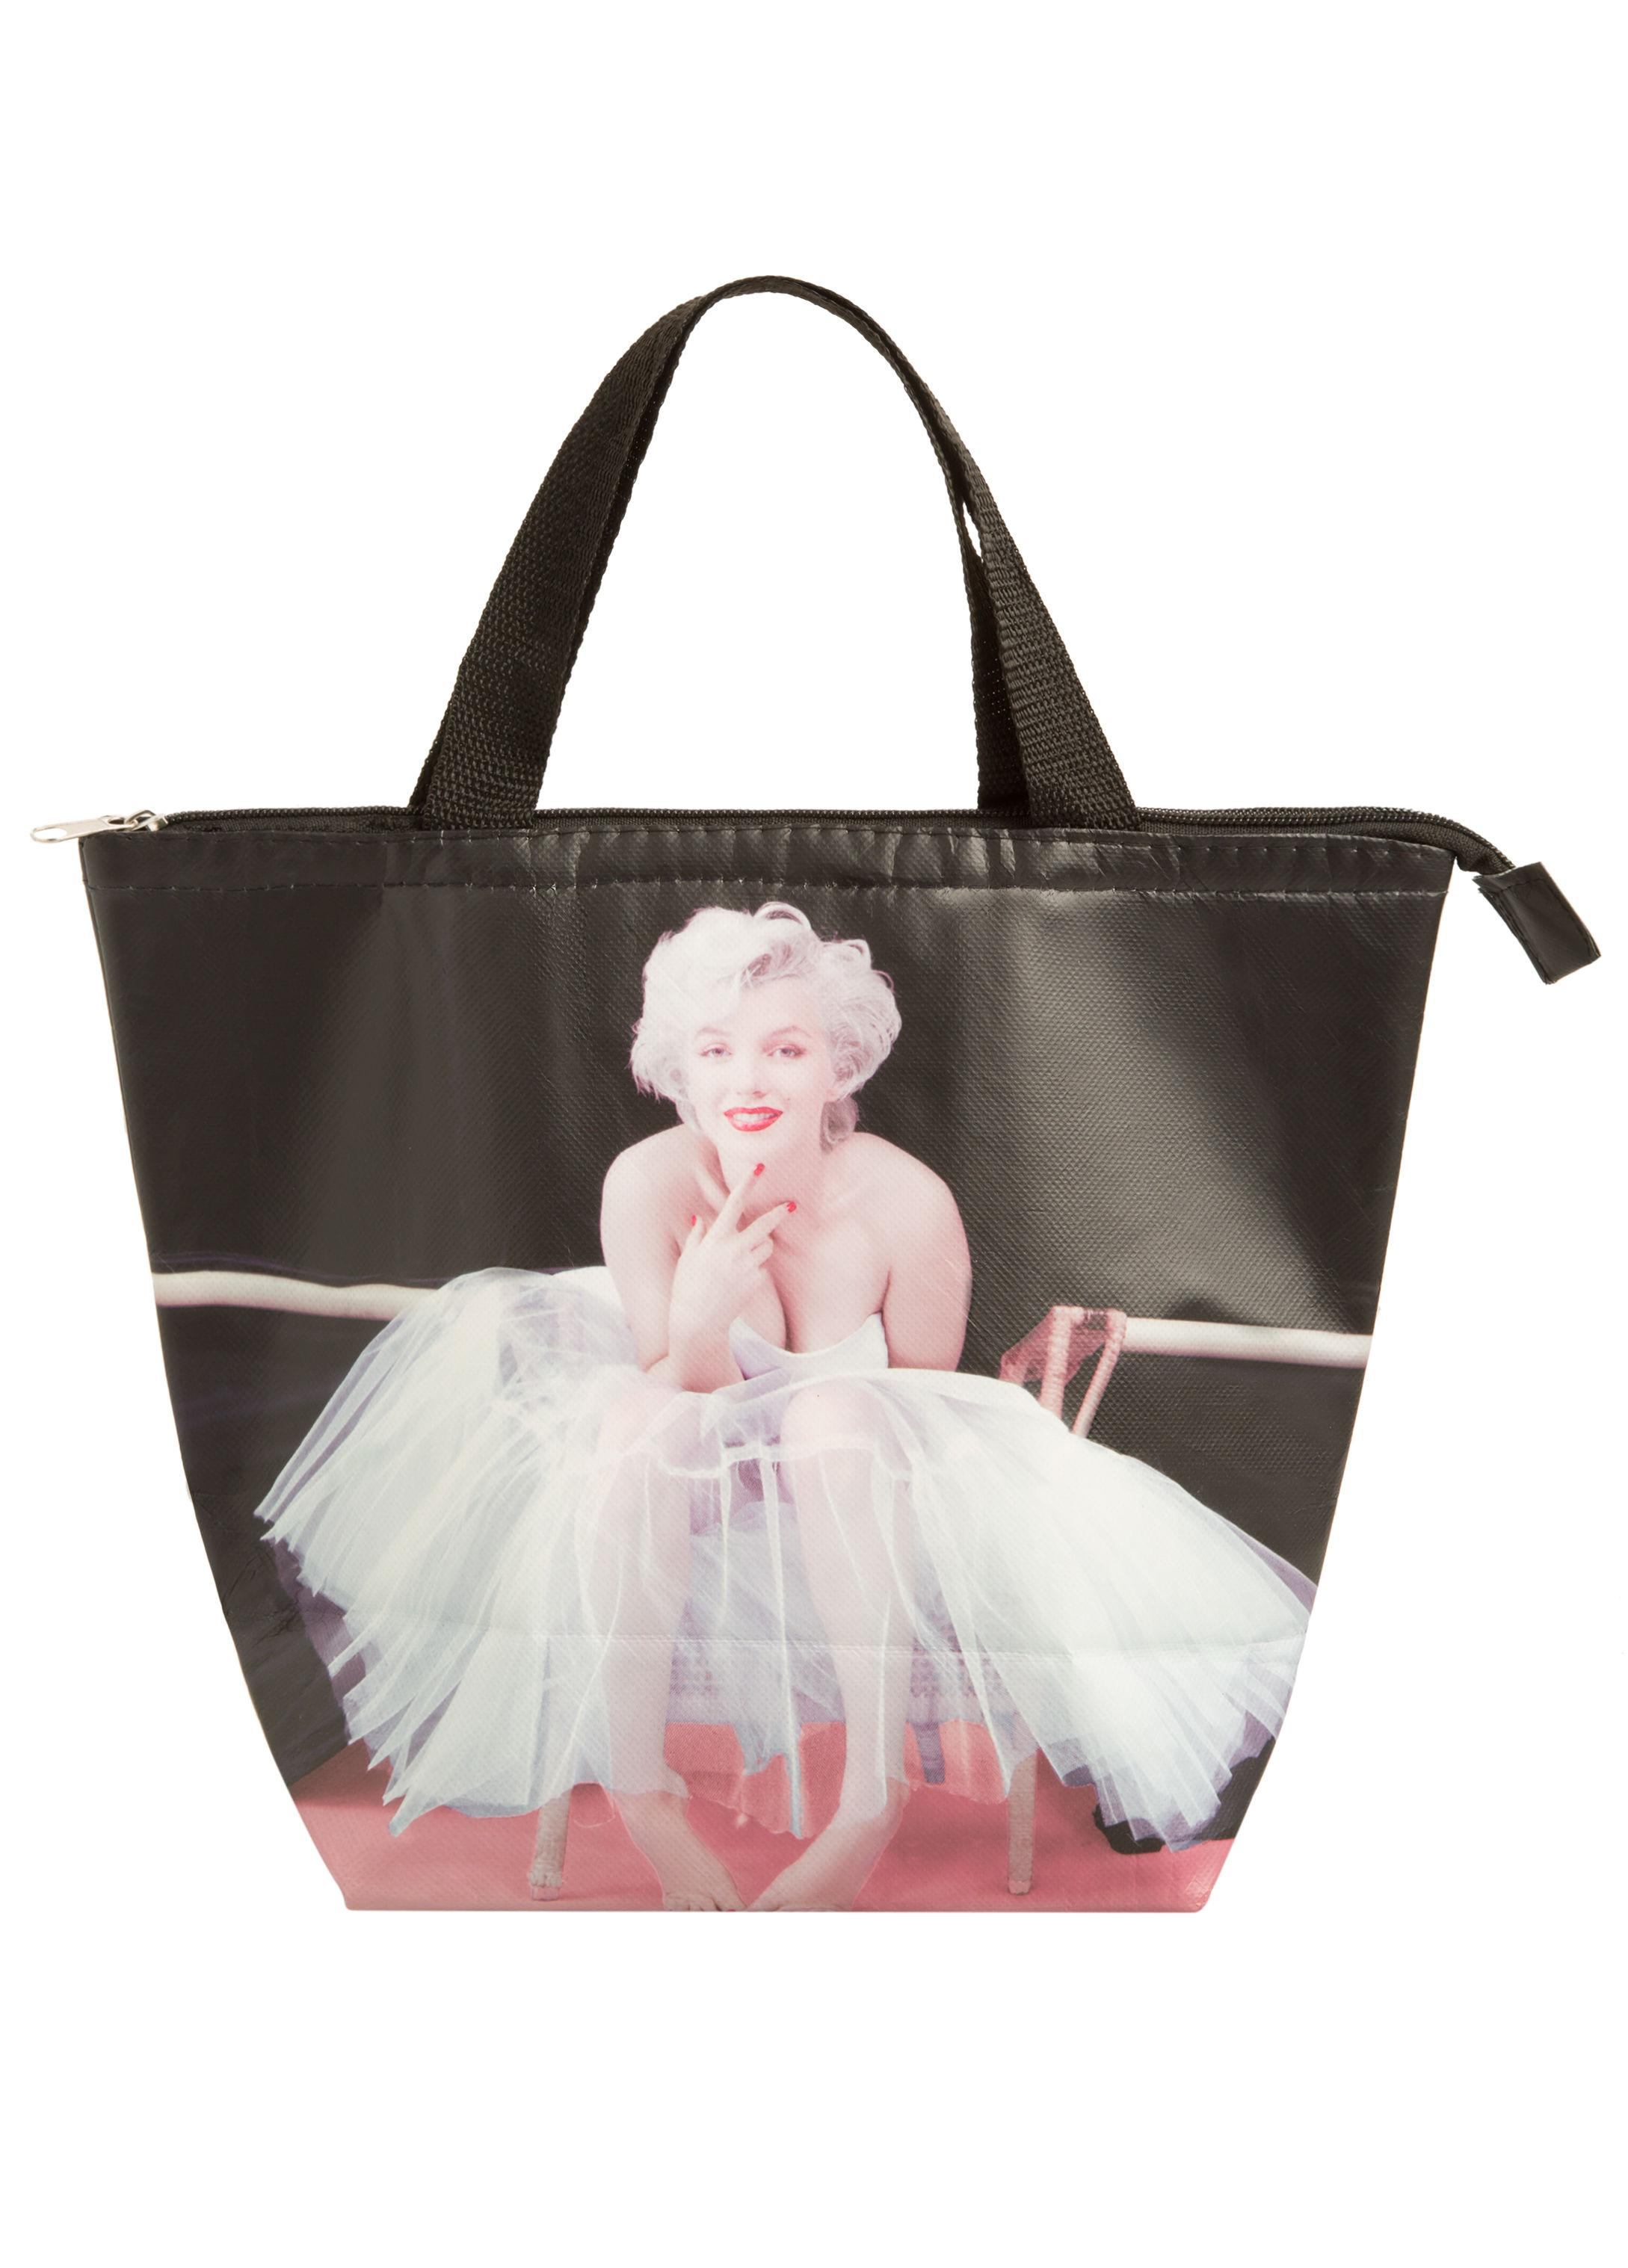 42cae87d8a Lyst - Ashley Stewart Be Joyful Marilyn Monroe Lunch Tote in Black